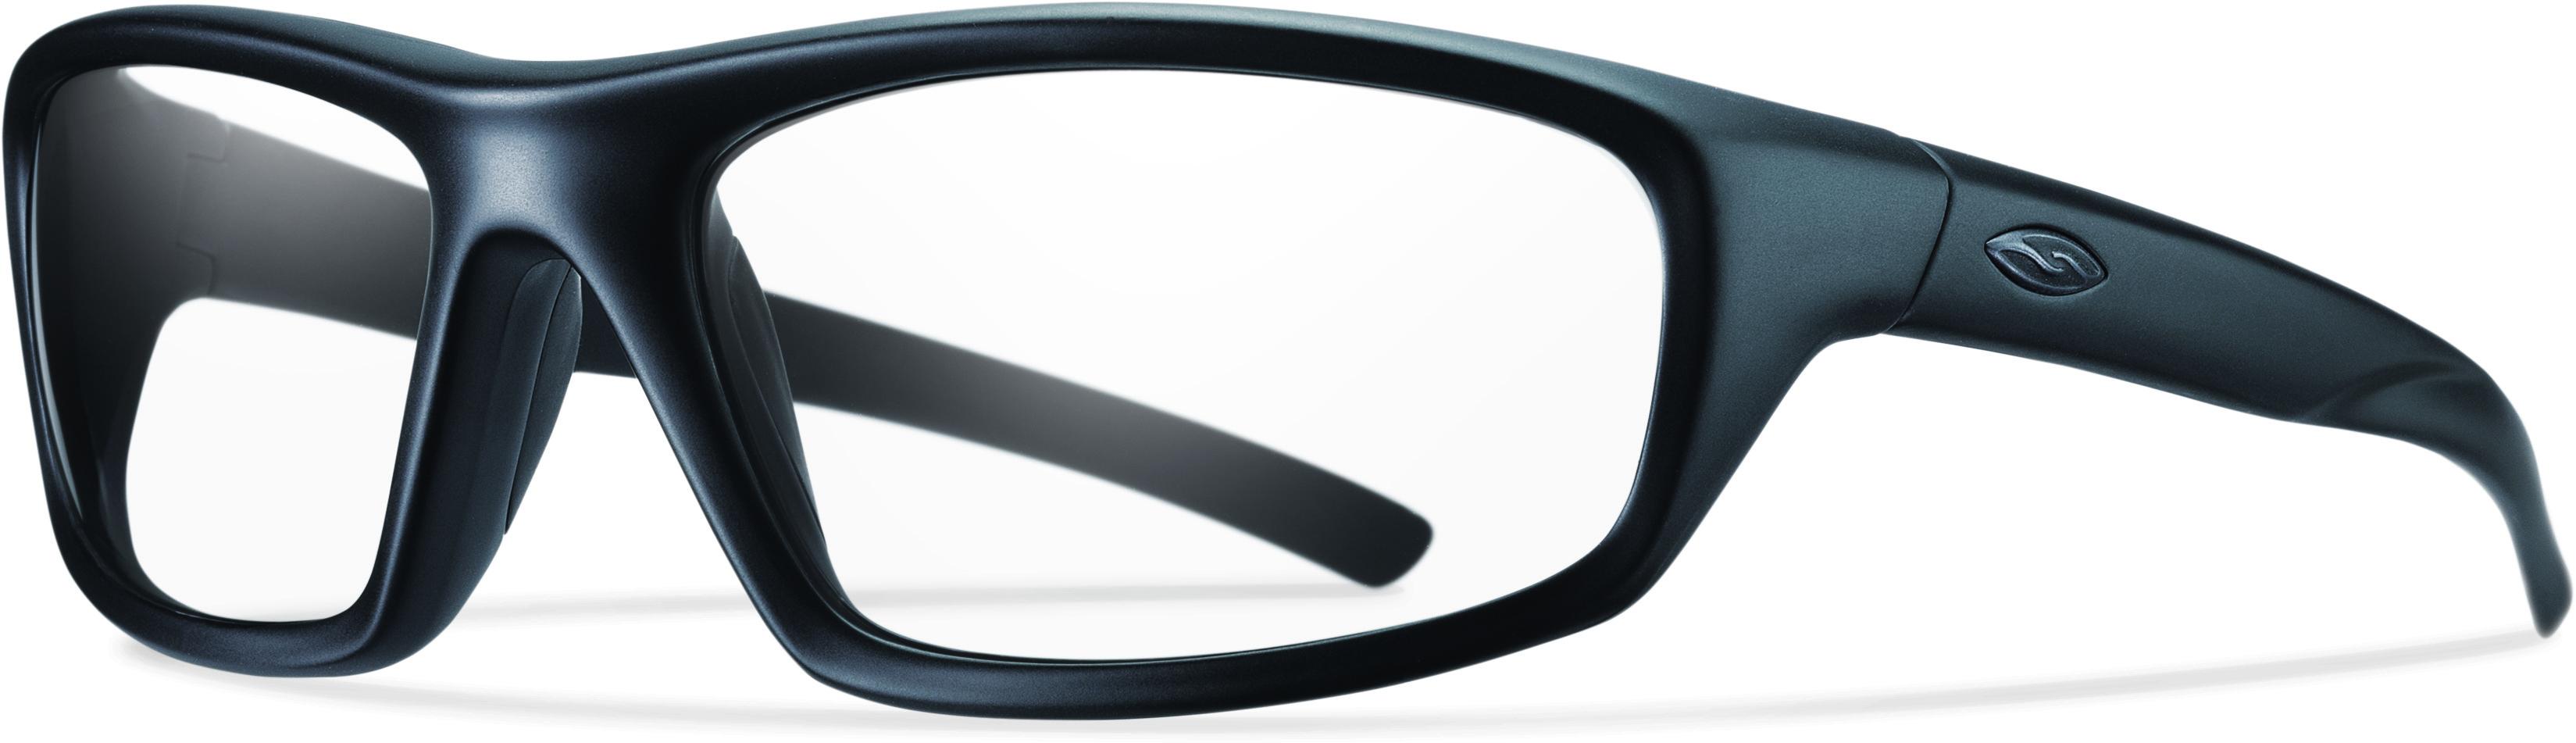 f0c1393279 Smith Elite Director Tactical Sunglasses